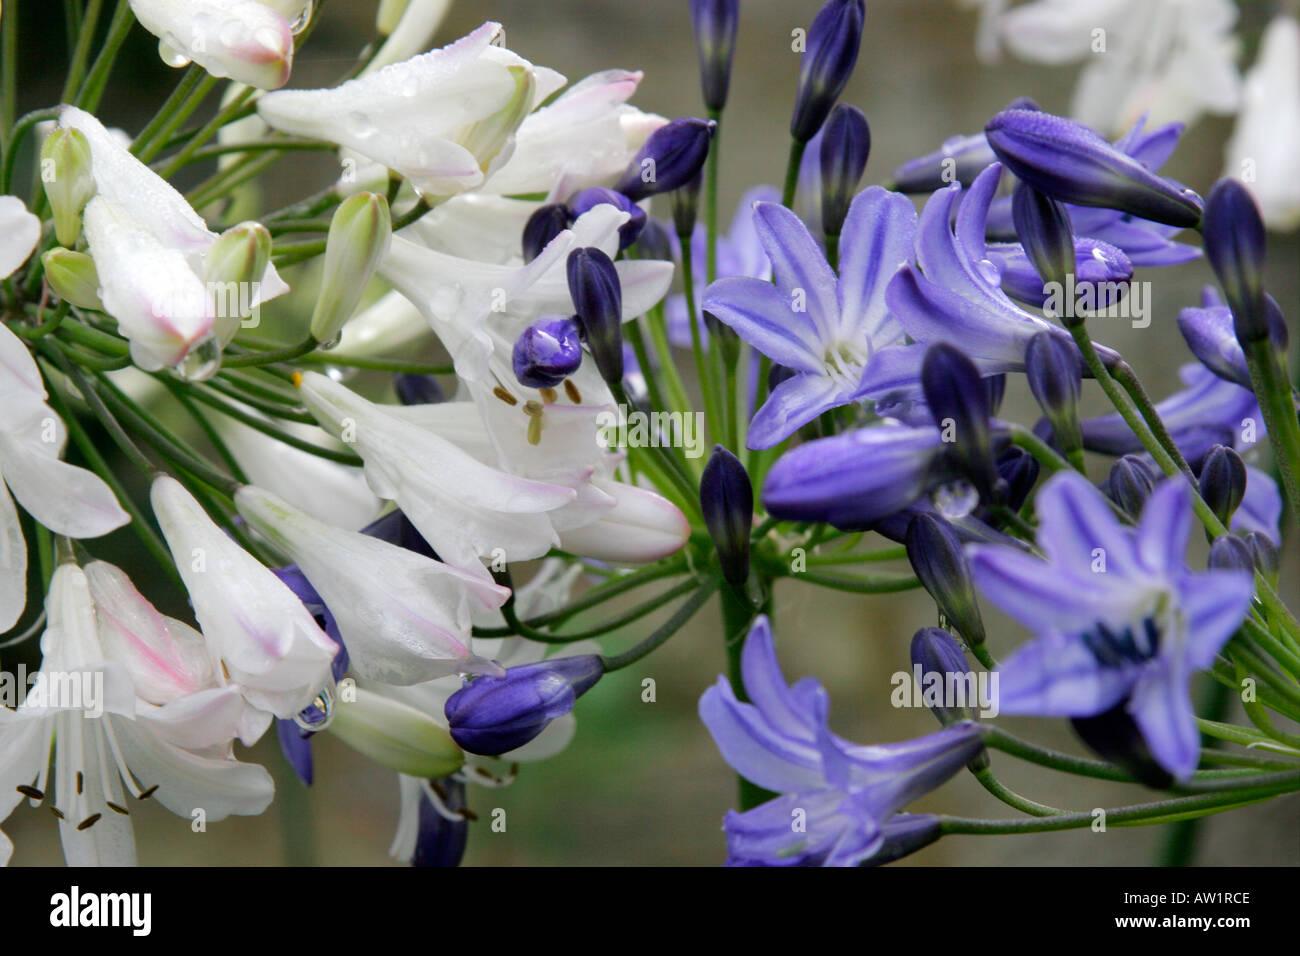 Blue and white flowers of garden plant agapanthus stock photo blue and white flowers of garden plant agapanthus izmirmasajfo